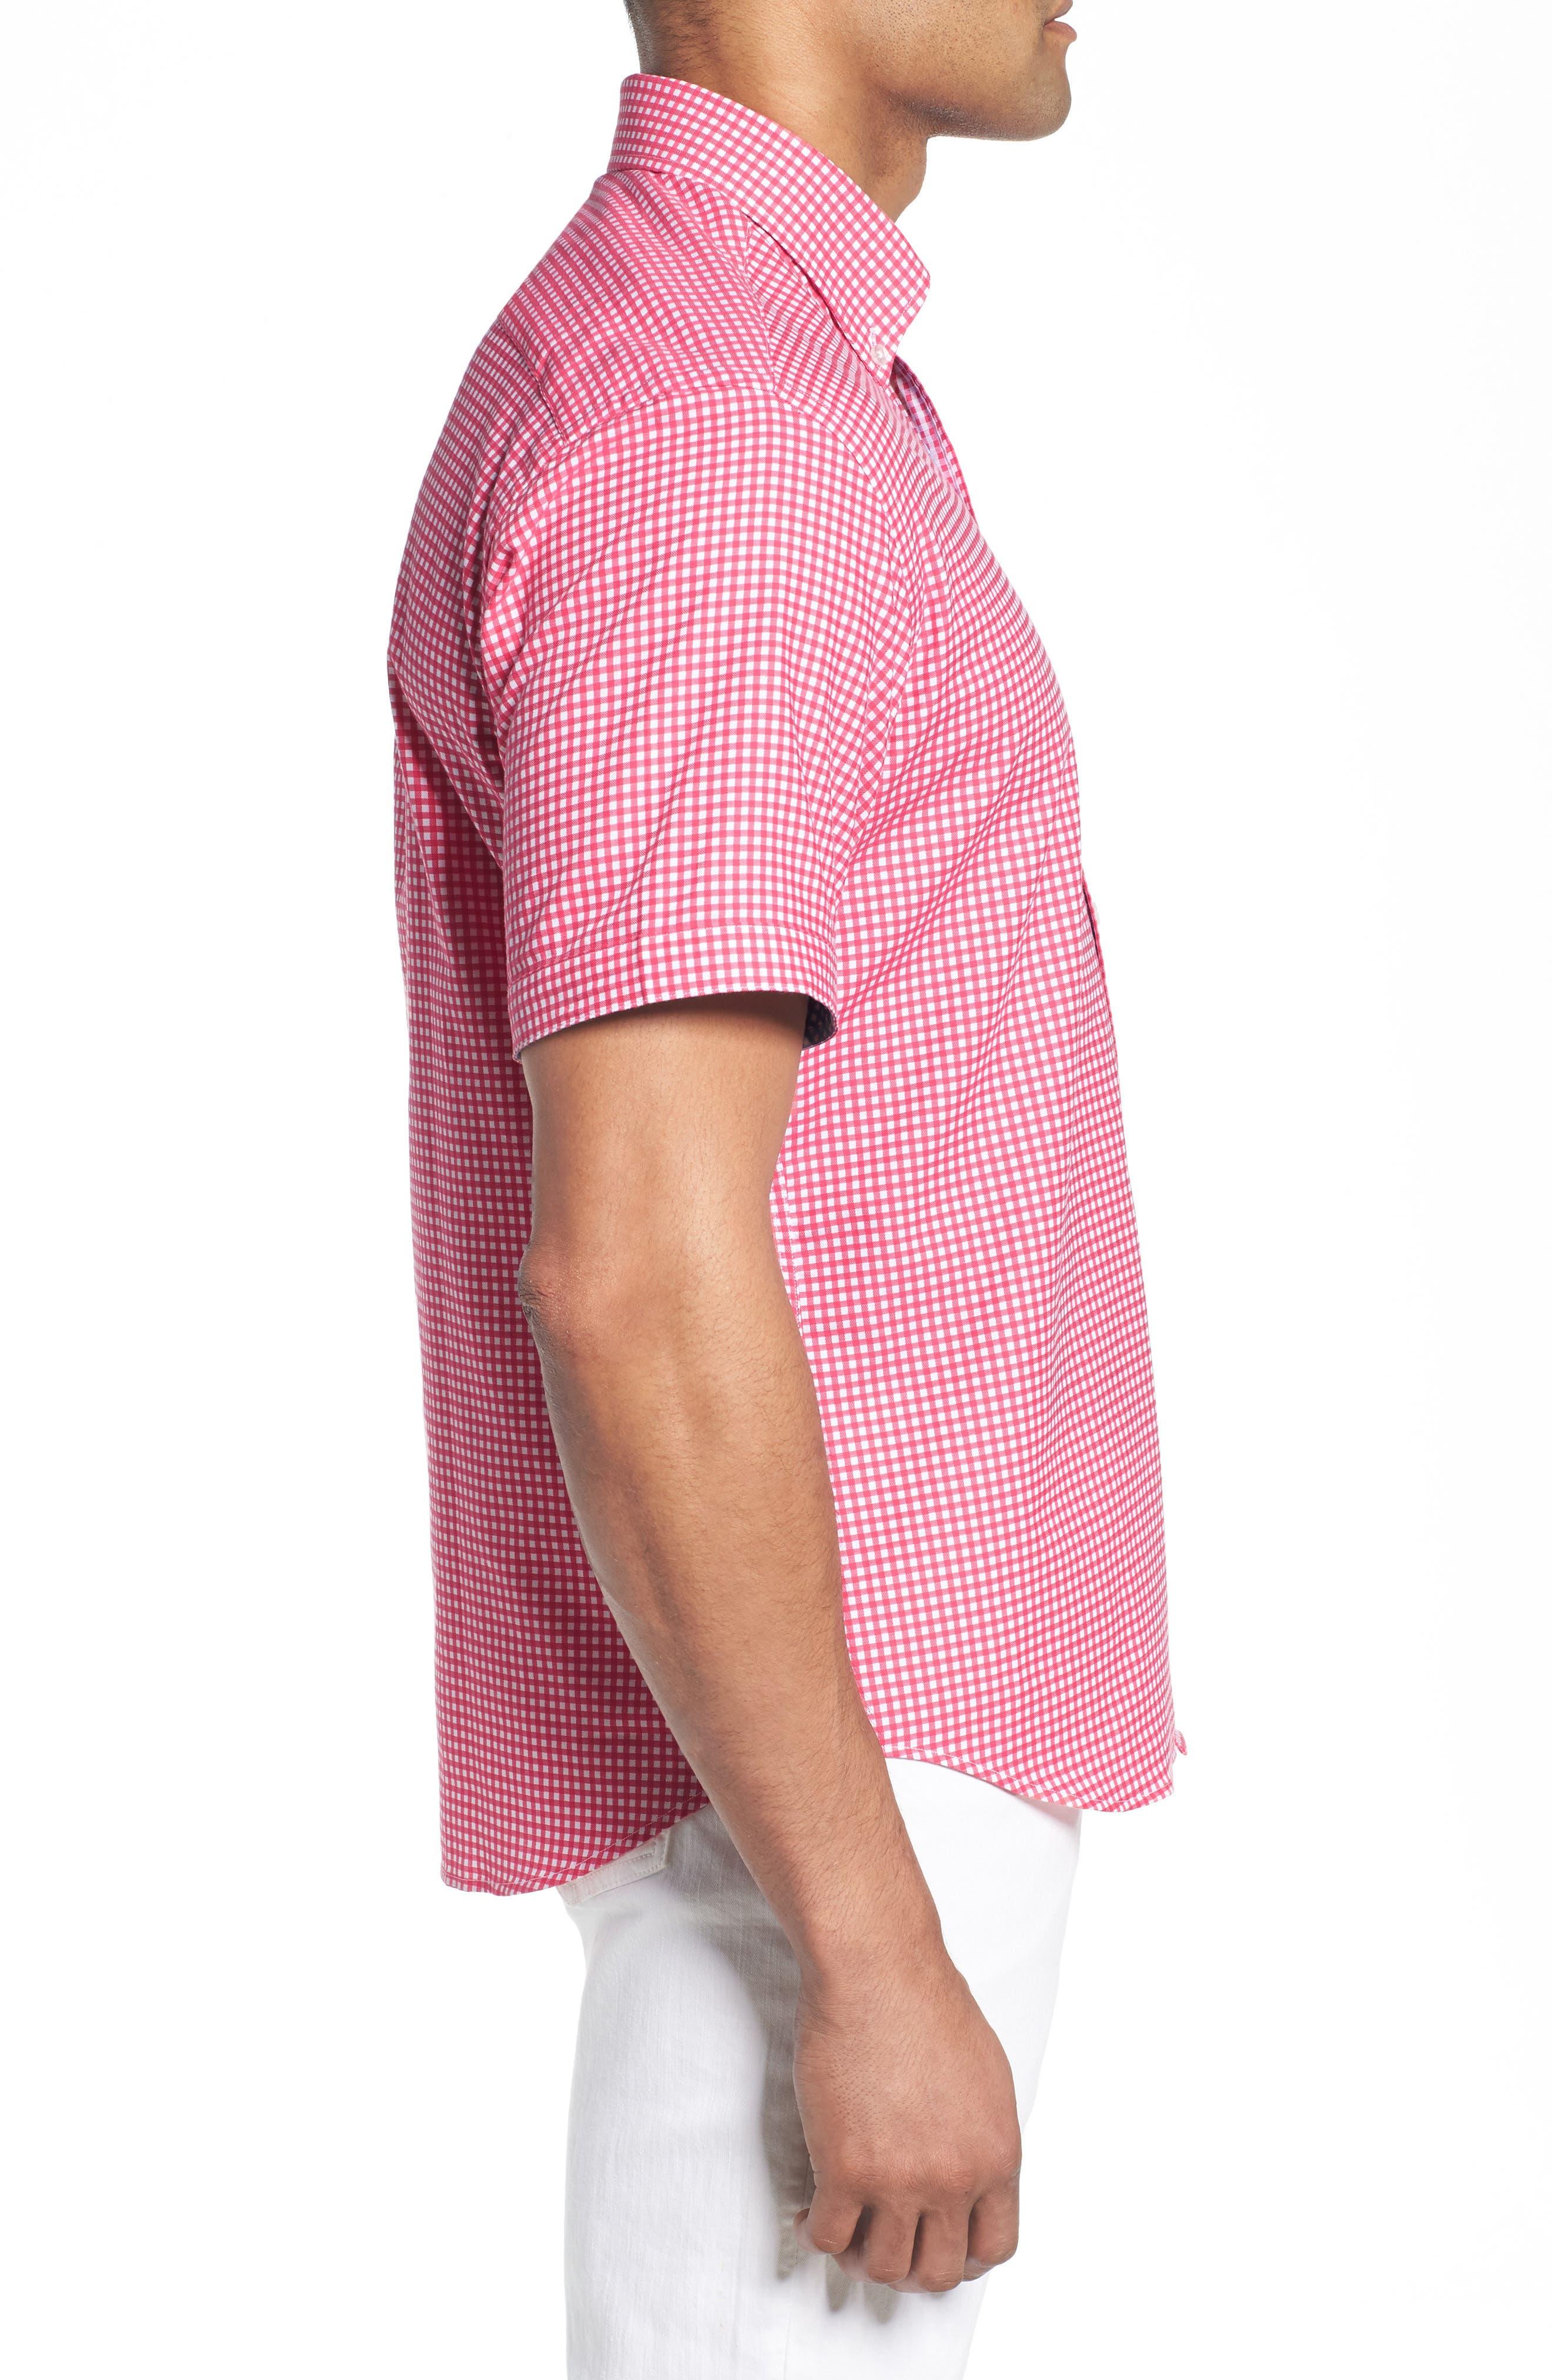 Aden Regular Fit Sport Shirt,                             Alternate thumbnail 4, color,                             Coral